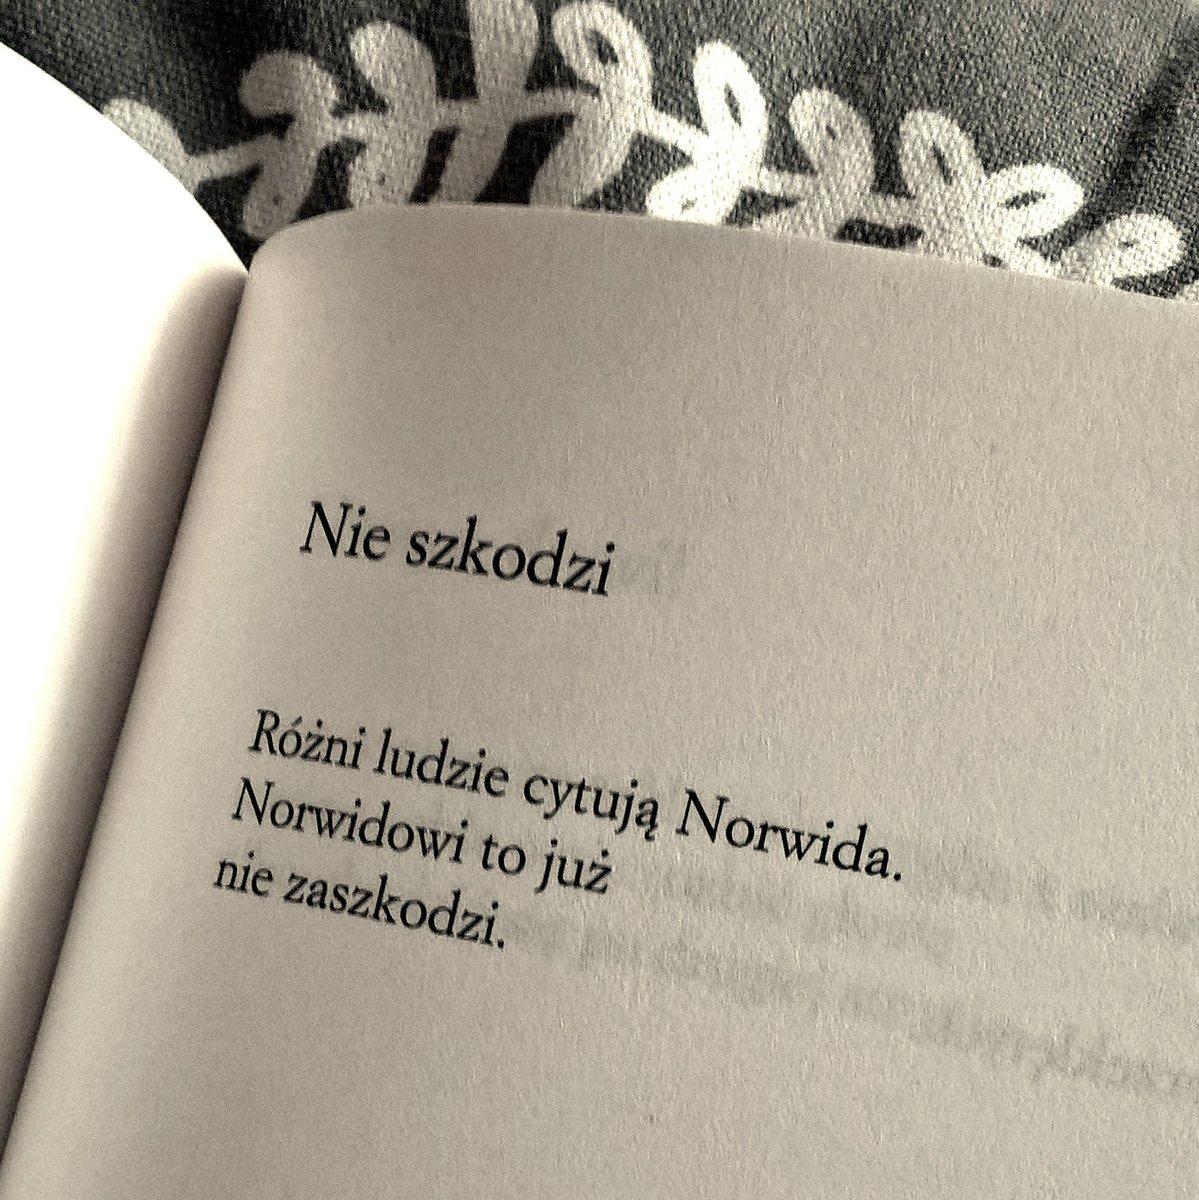 Robert Rutkowski En Twitter Tadeusz Różewicz Na Dziś